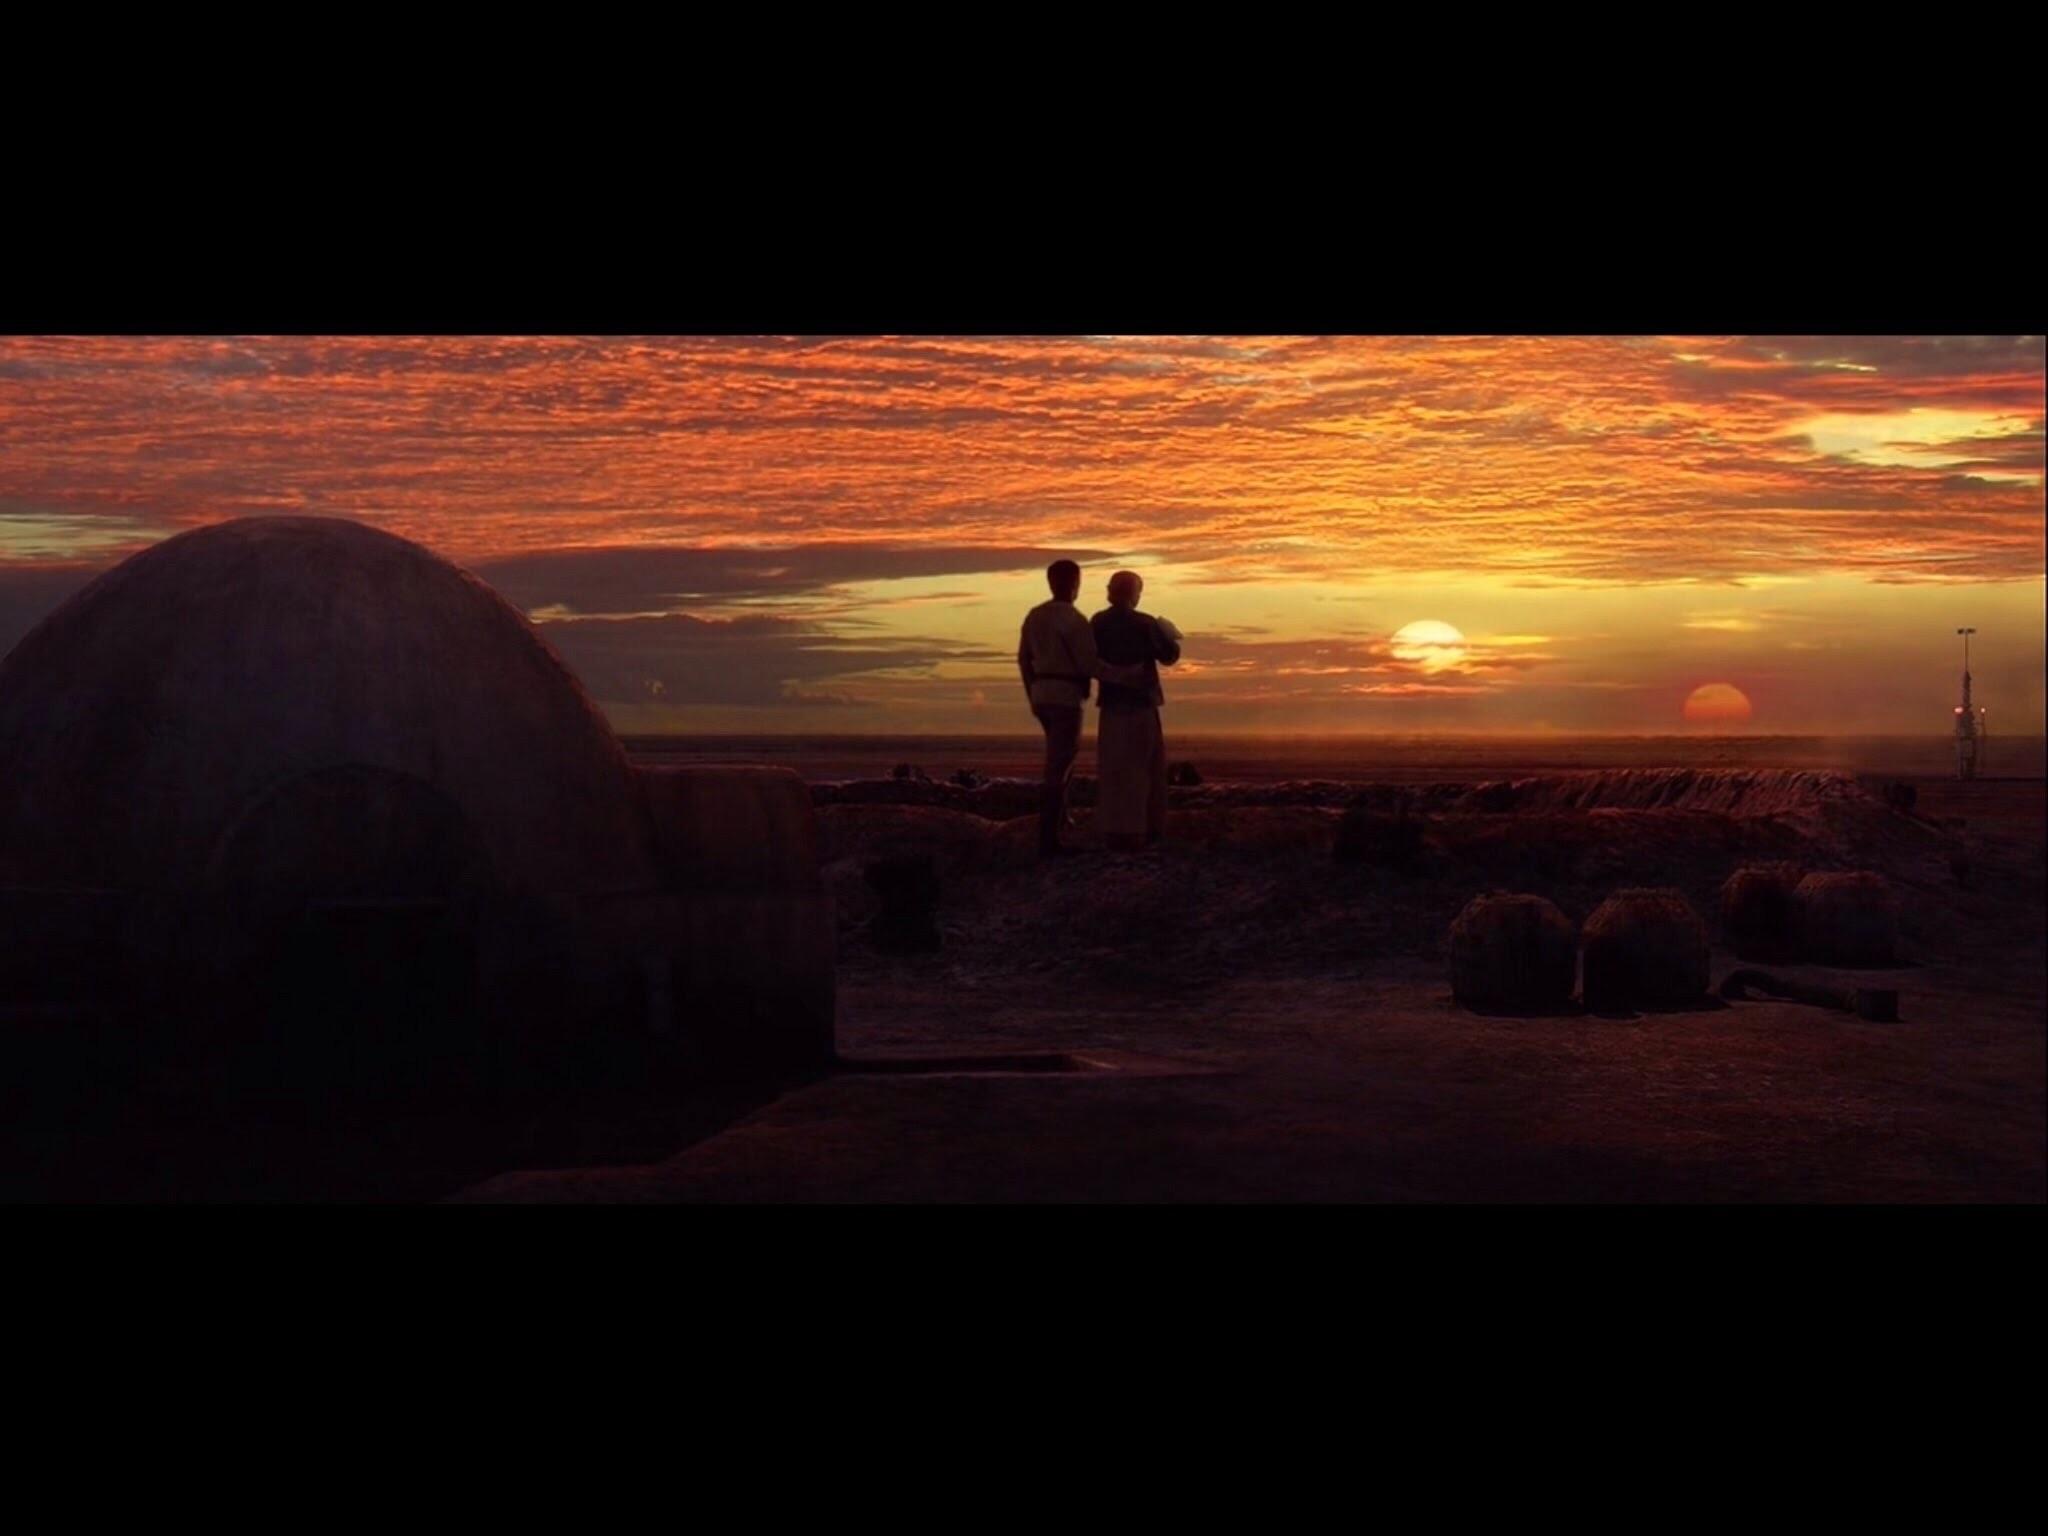 Star Wars Episode III: Revenge of the Sith – Ending – HD 1080p – YouTube